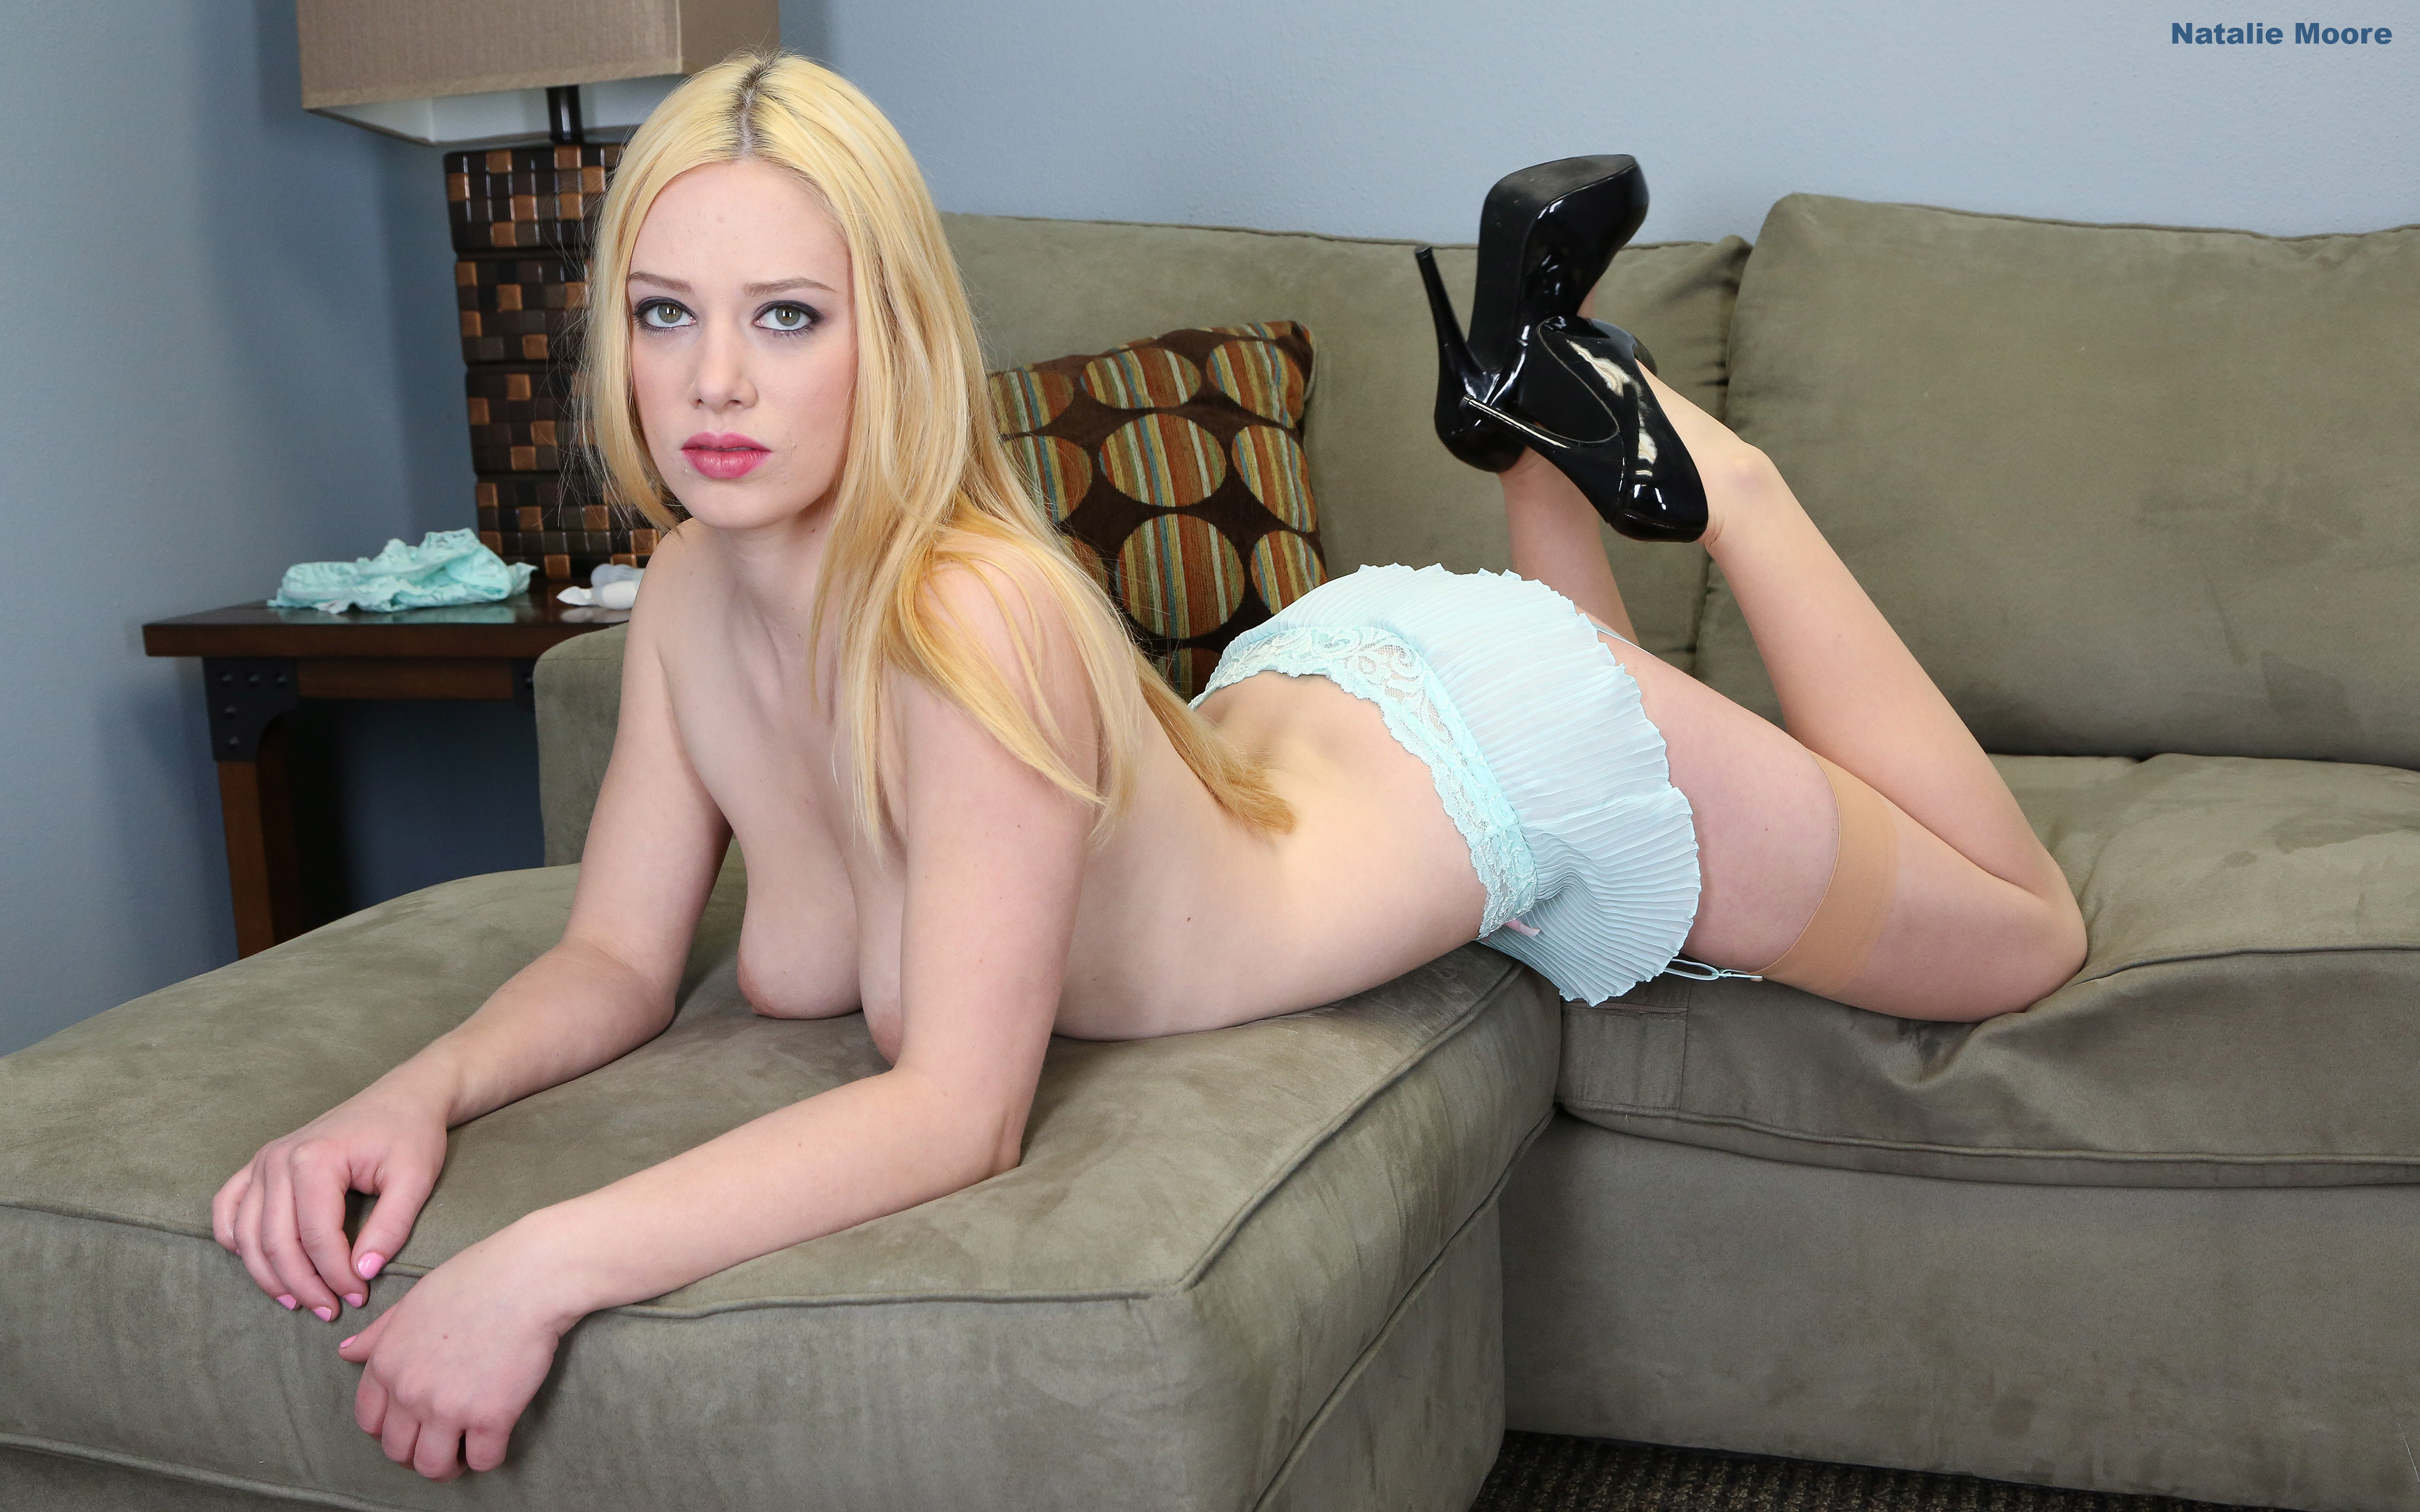 Download photo 1920x1080, natalie moore, stockings, heels ...